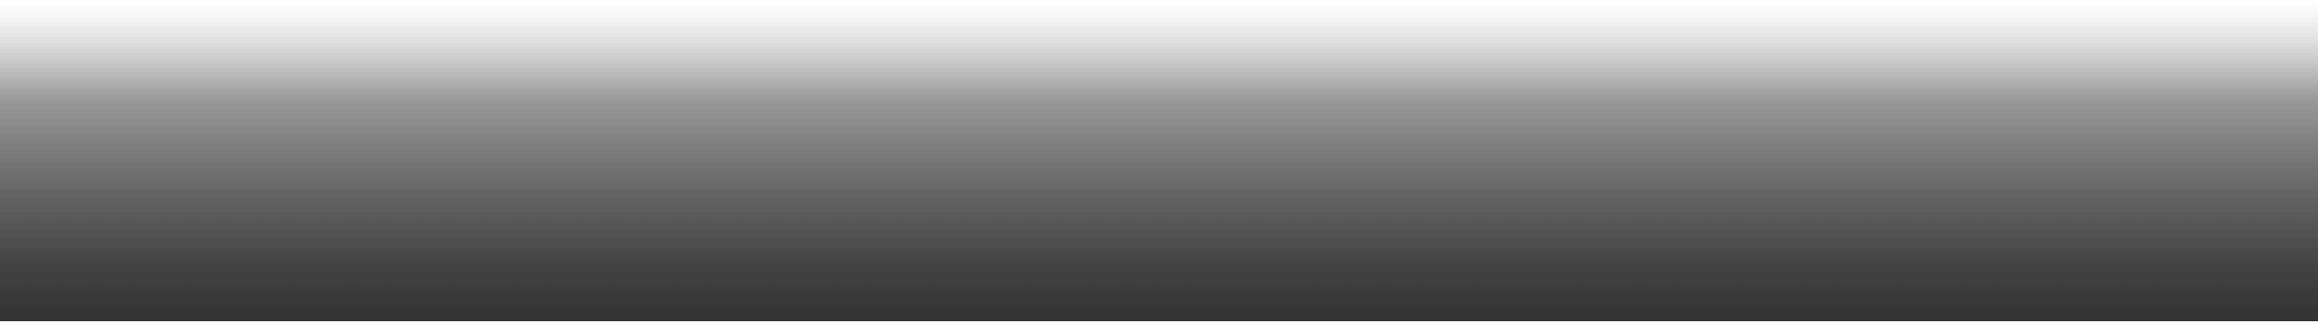 長方形 9_2x.png